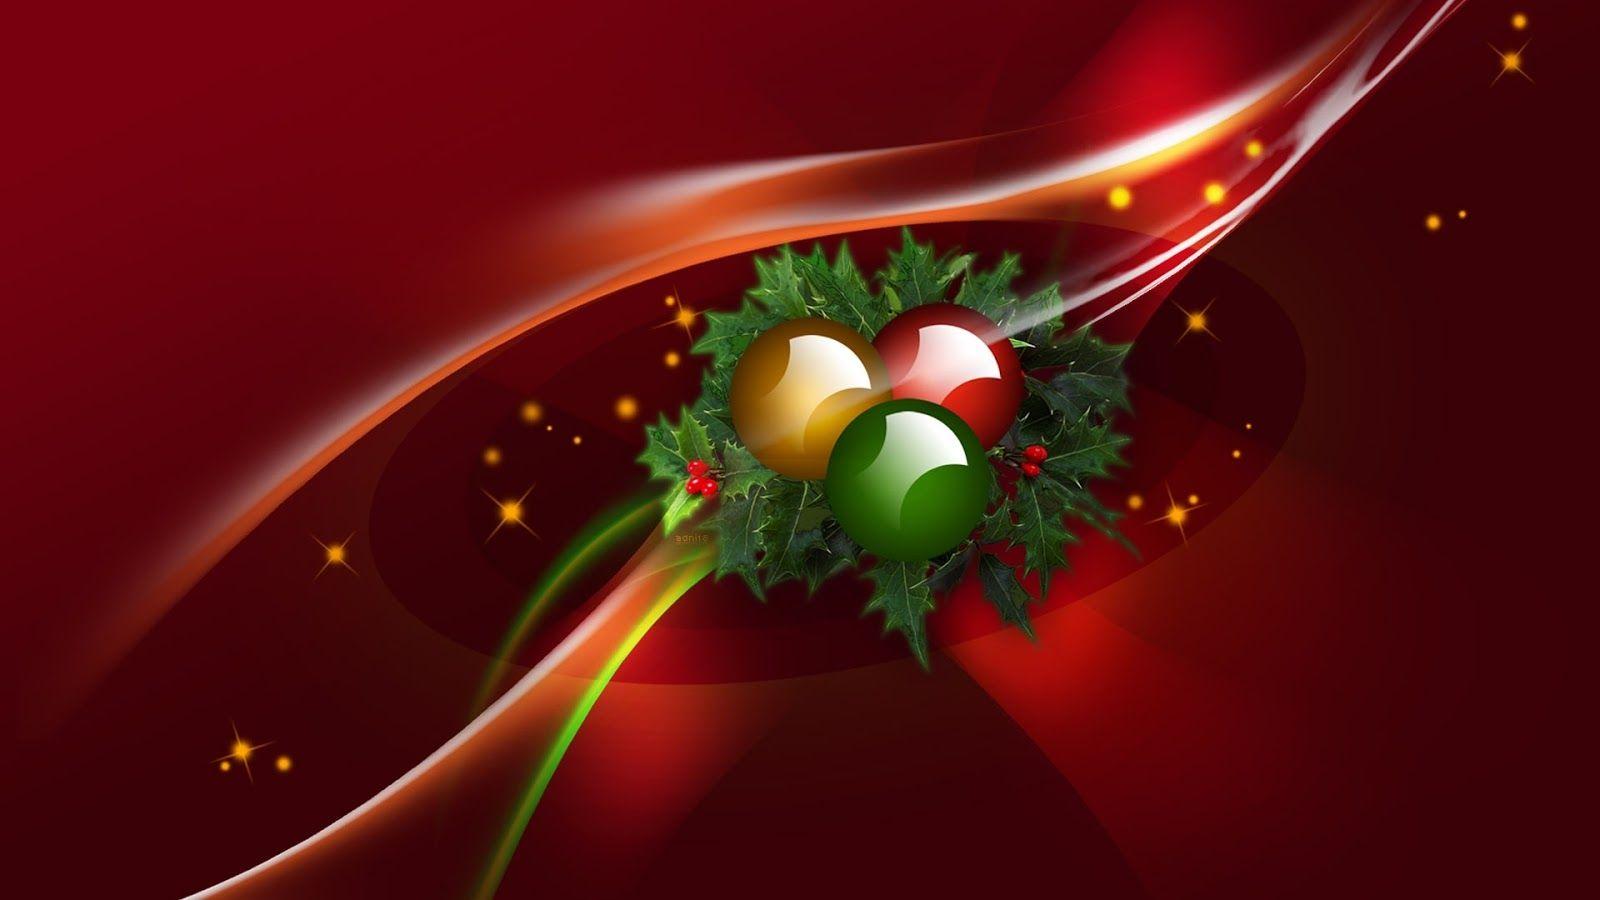 Happy Christmas Full Hd 50 Wallpapers 1920x1080 Boss Wallpapers 5k 4k And 8k Ult Christmas Wallpaper Free Christmas Desktop Wallpaper Christmas Wallpaper Hd